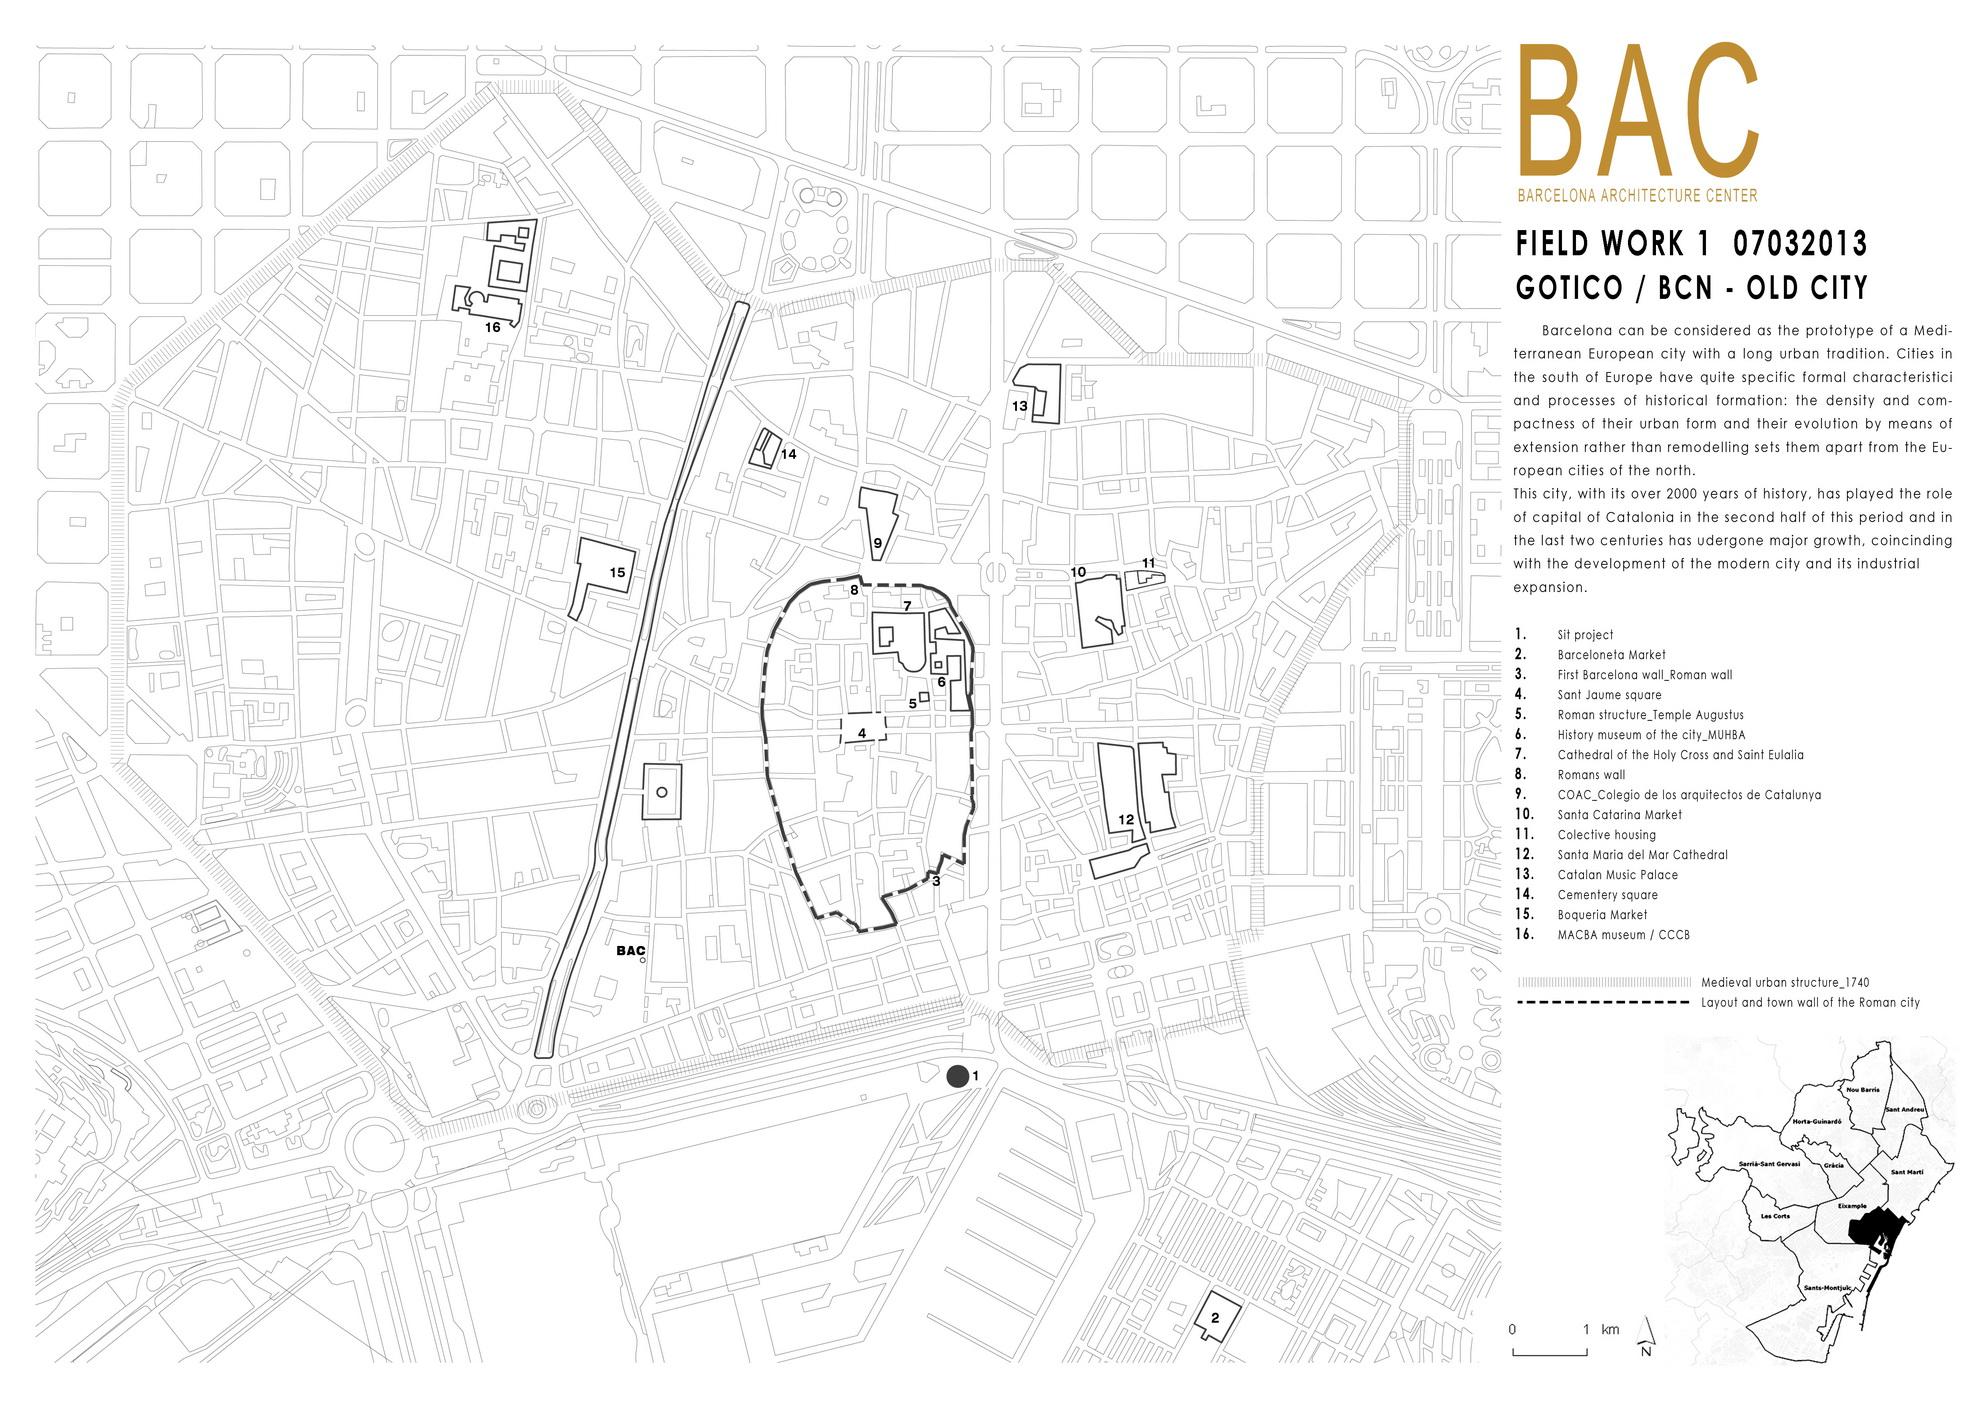 bac barcelona architecture center